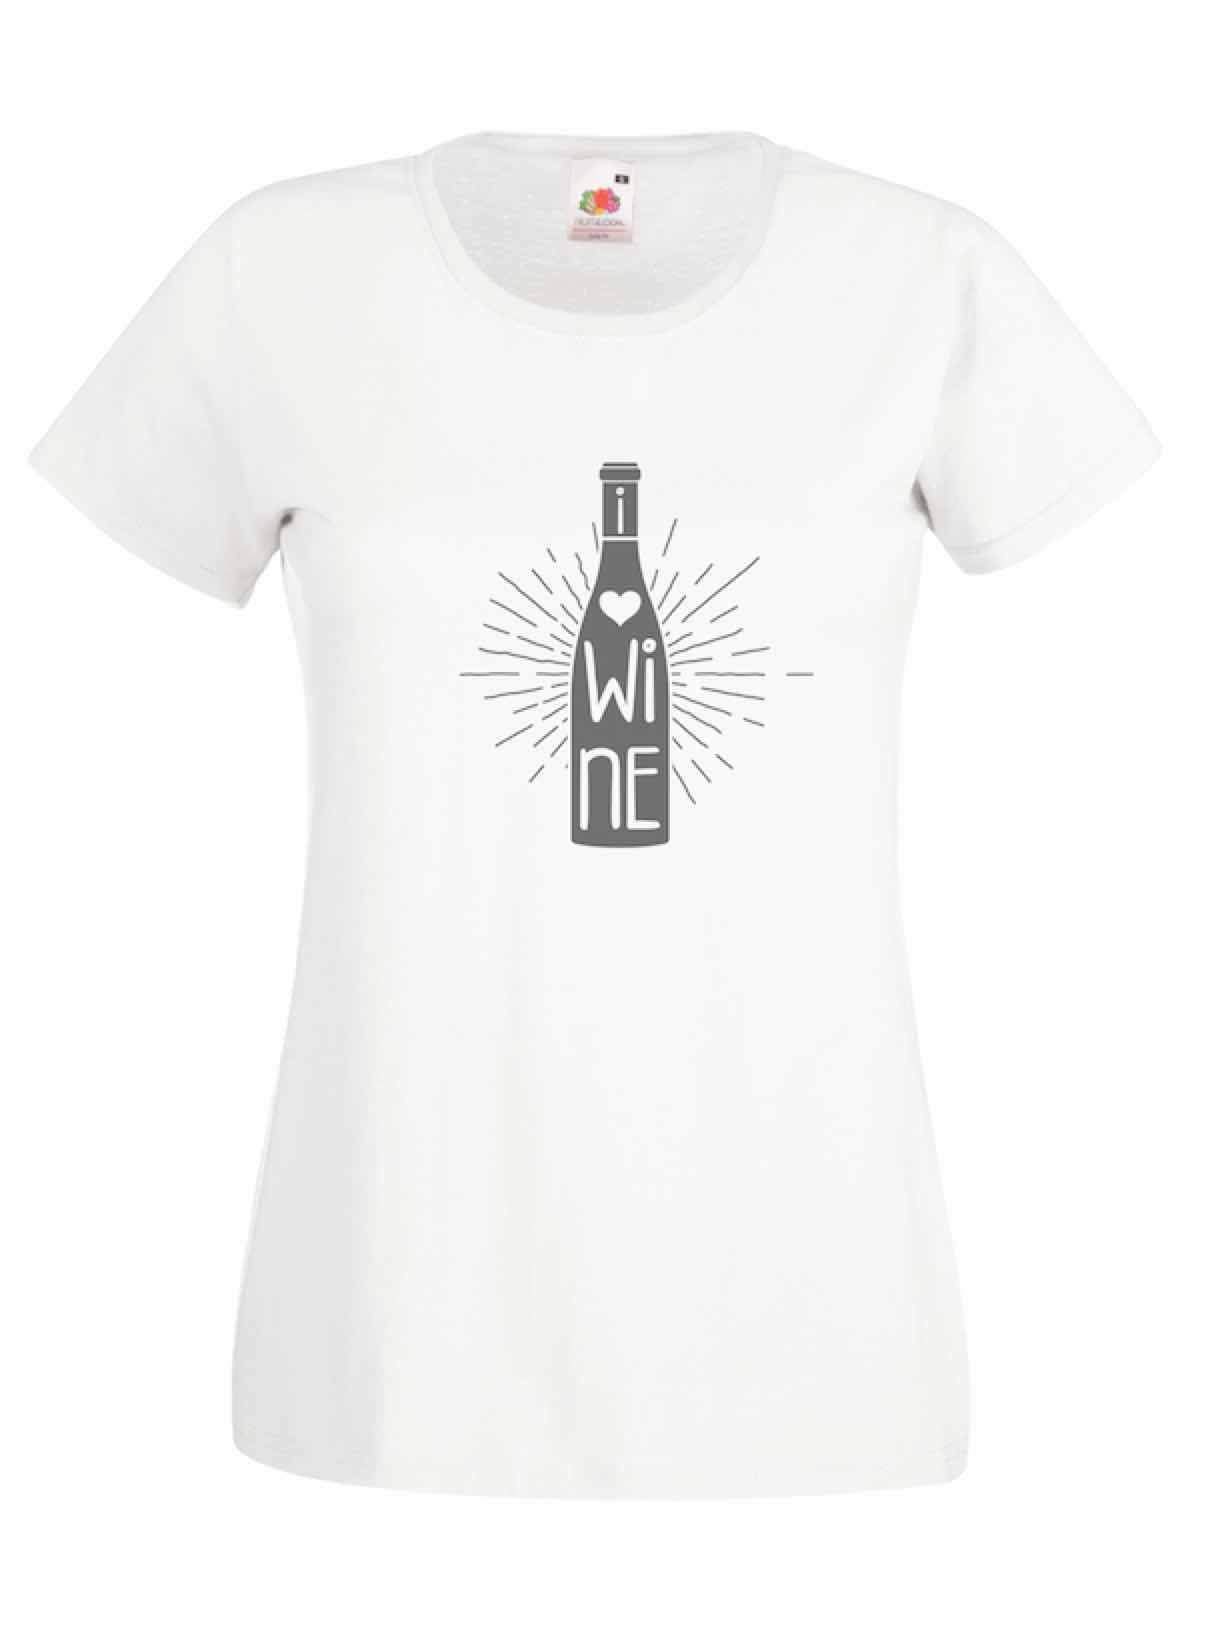 Wine design for t-shirt, hoodie & sweatshirt